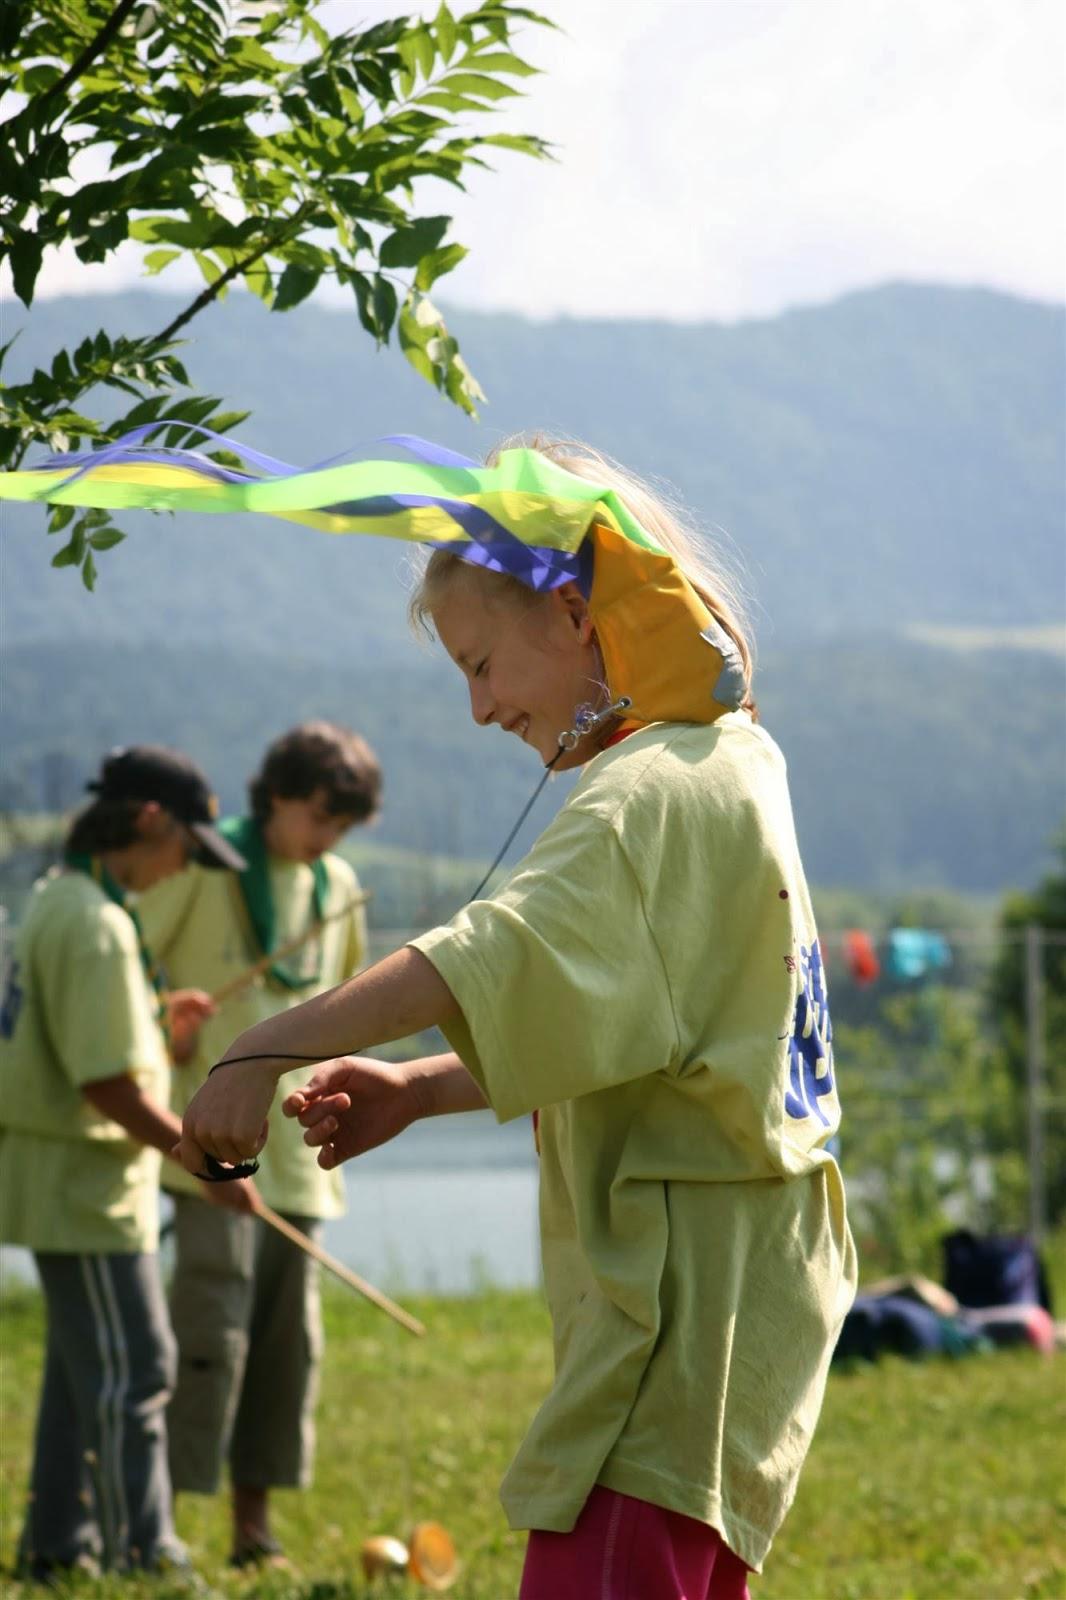 Državni mnogoboj, Velenje 2007 - IMG_8776.jpg